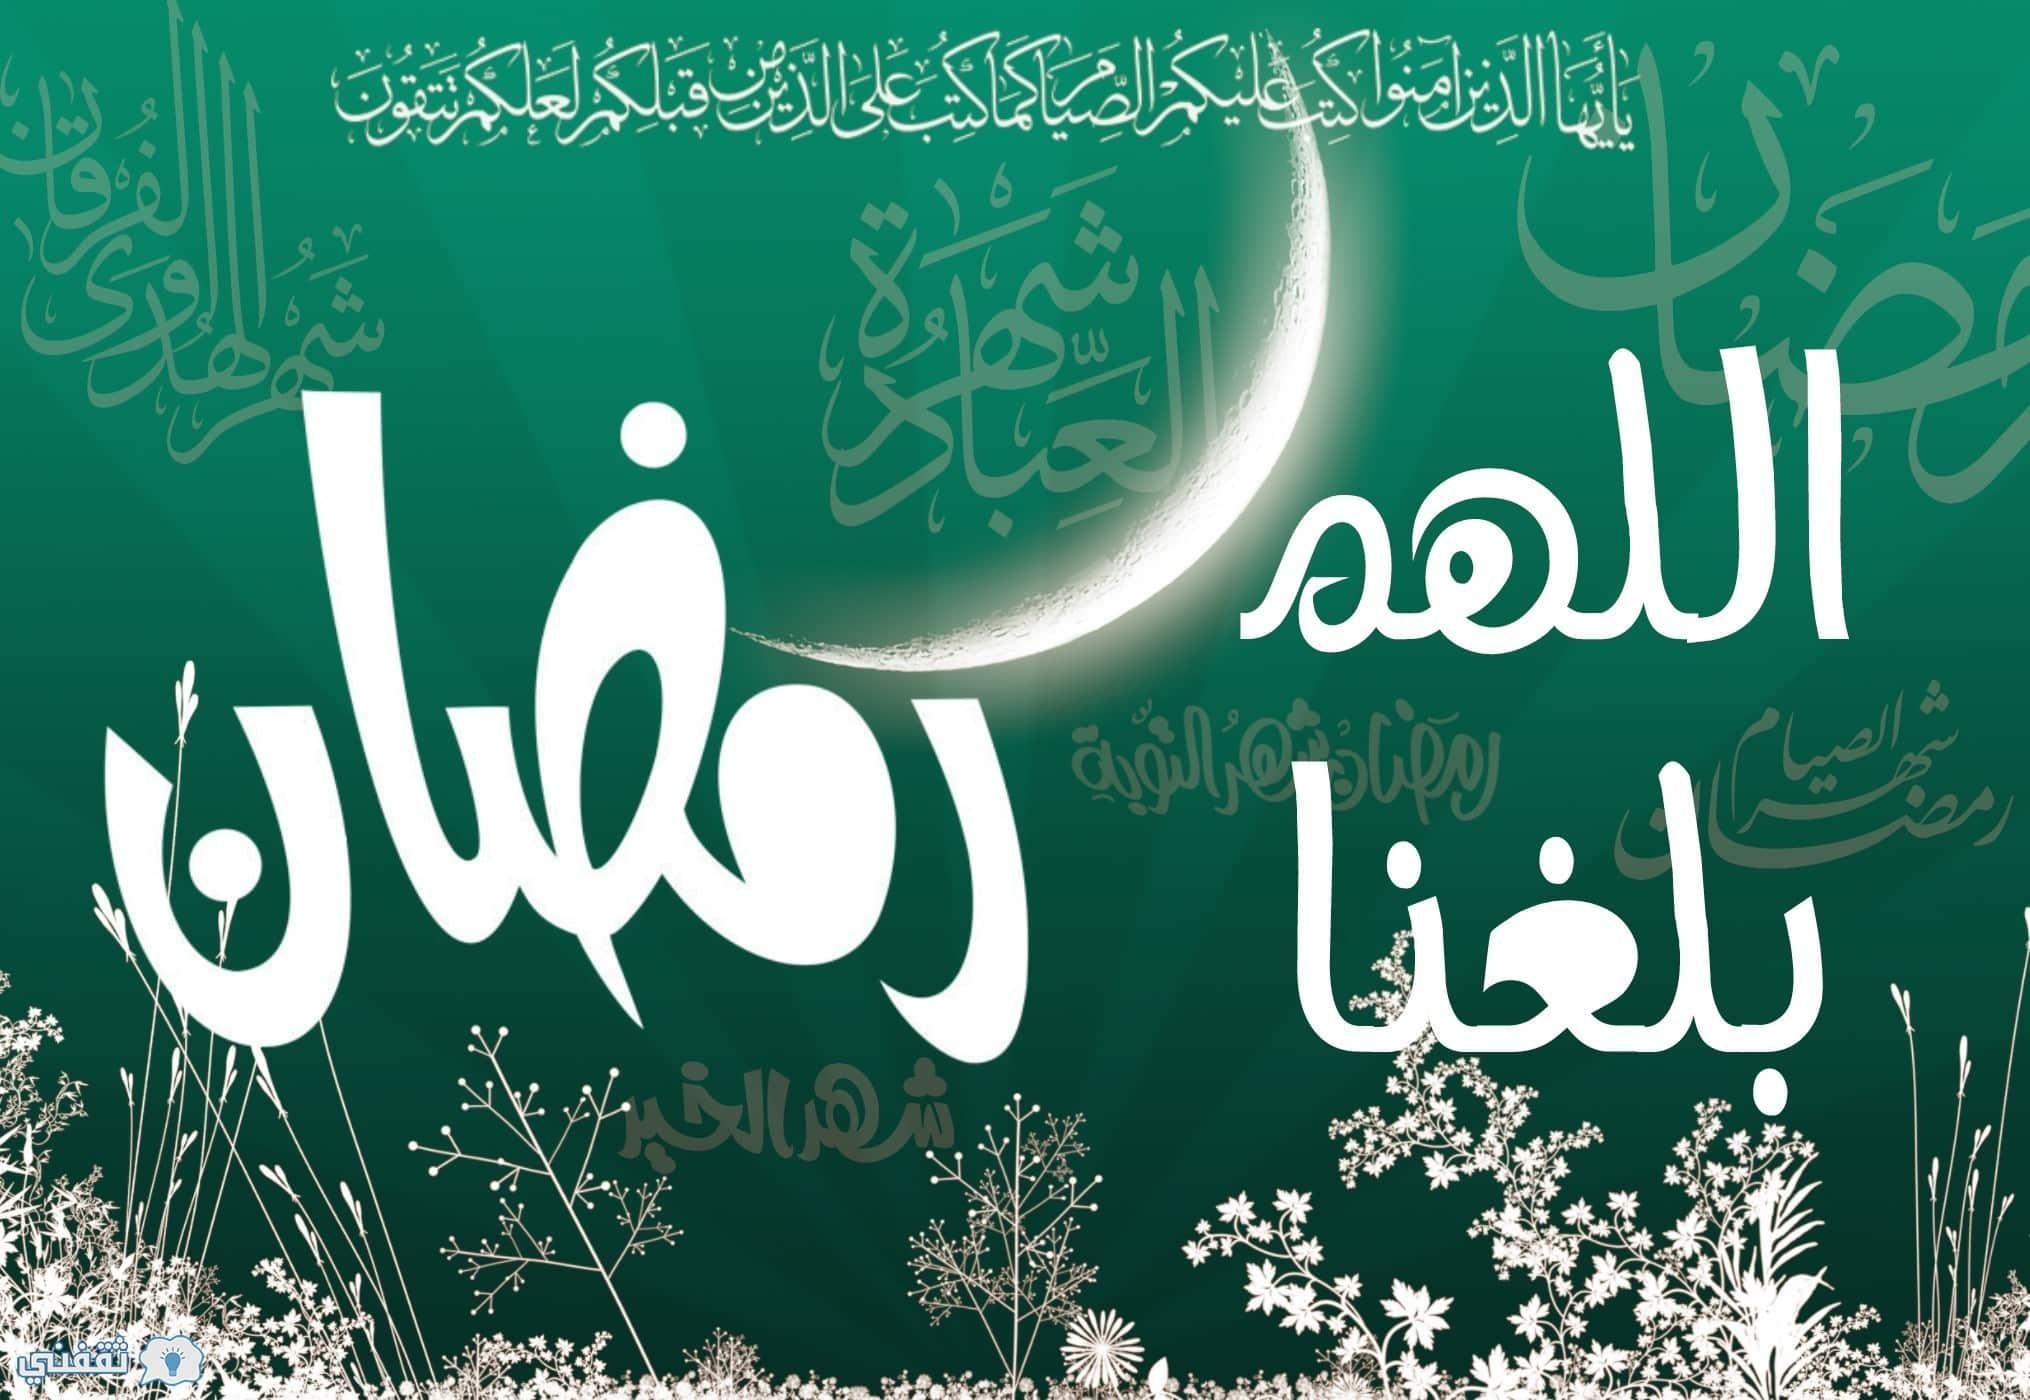 بالصور دعاء الافطار في رمضان , ادعية رمضان 5334 3